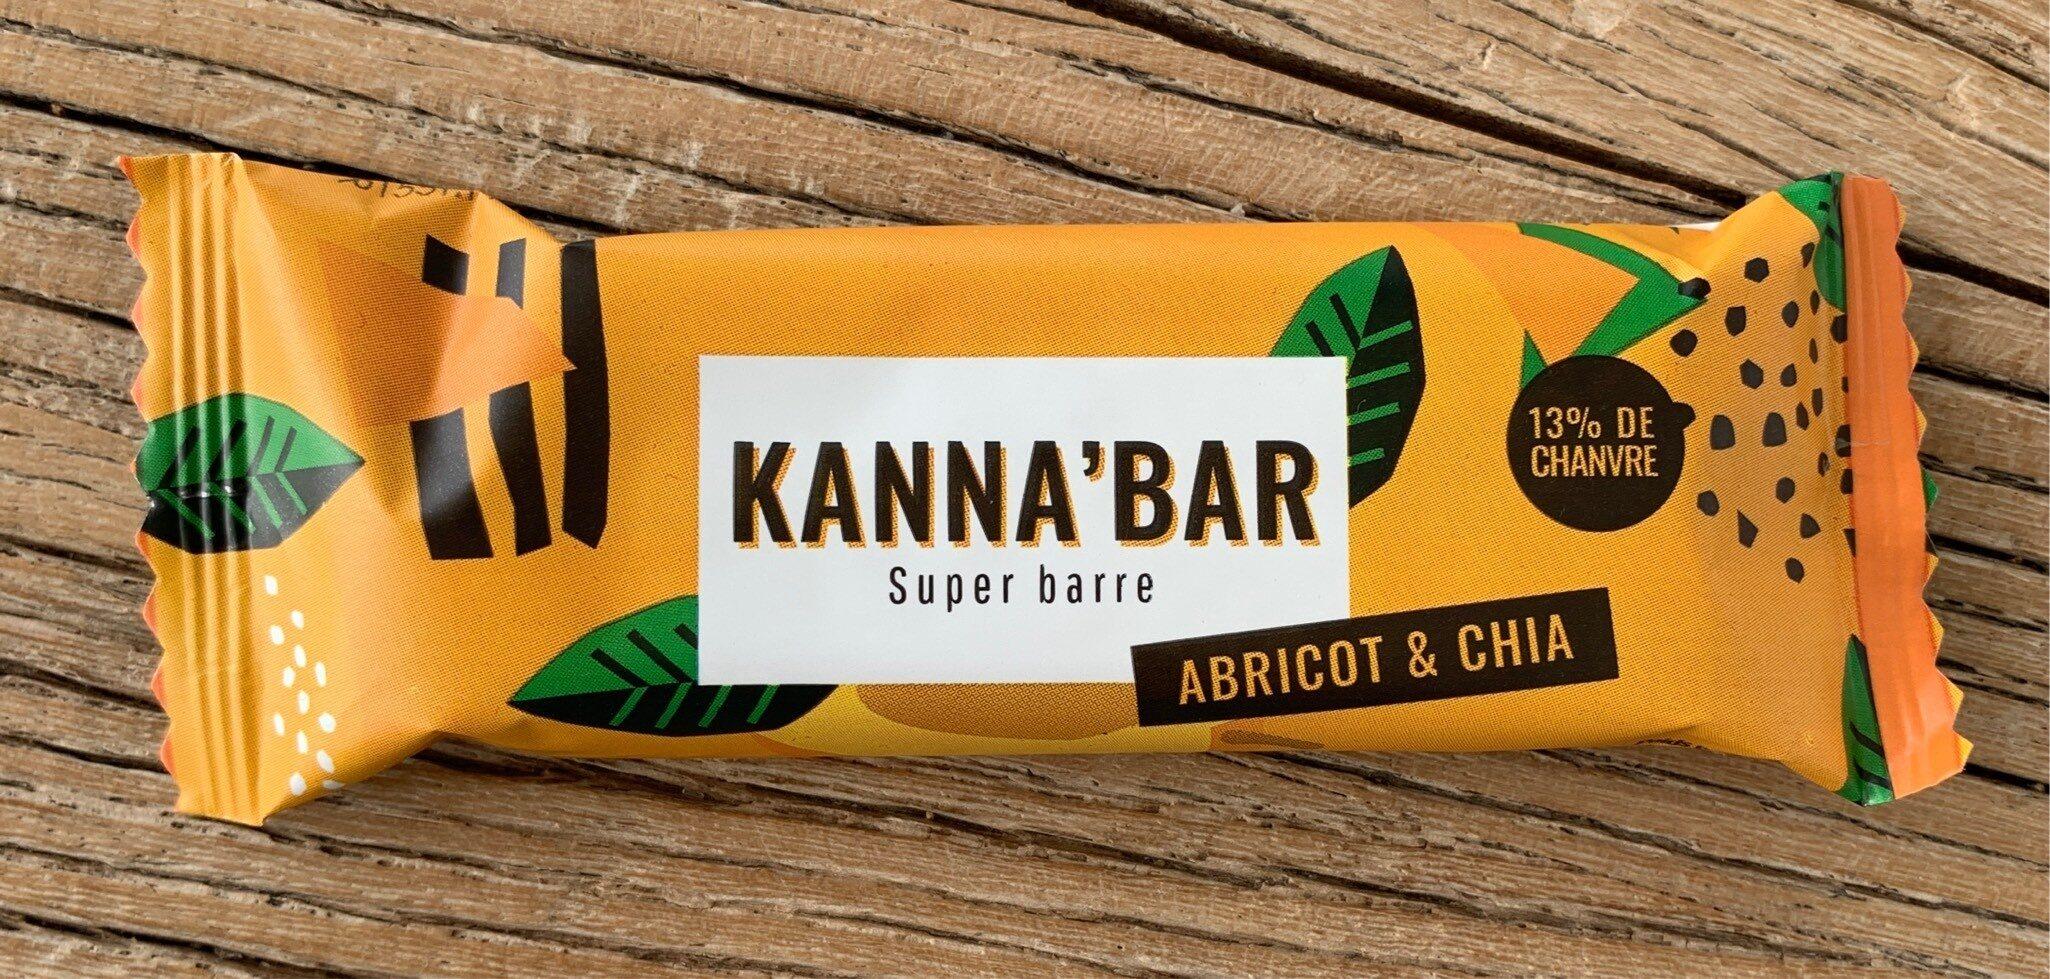 Kanna'bar abricot chia - Product - fr